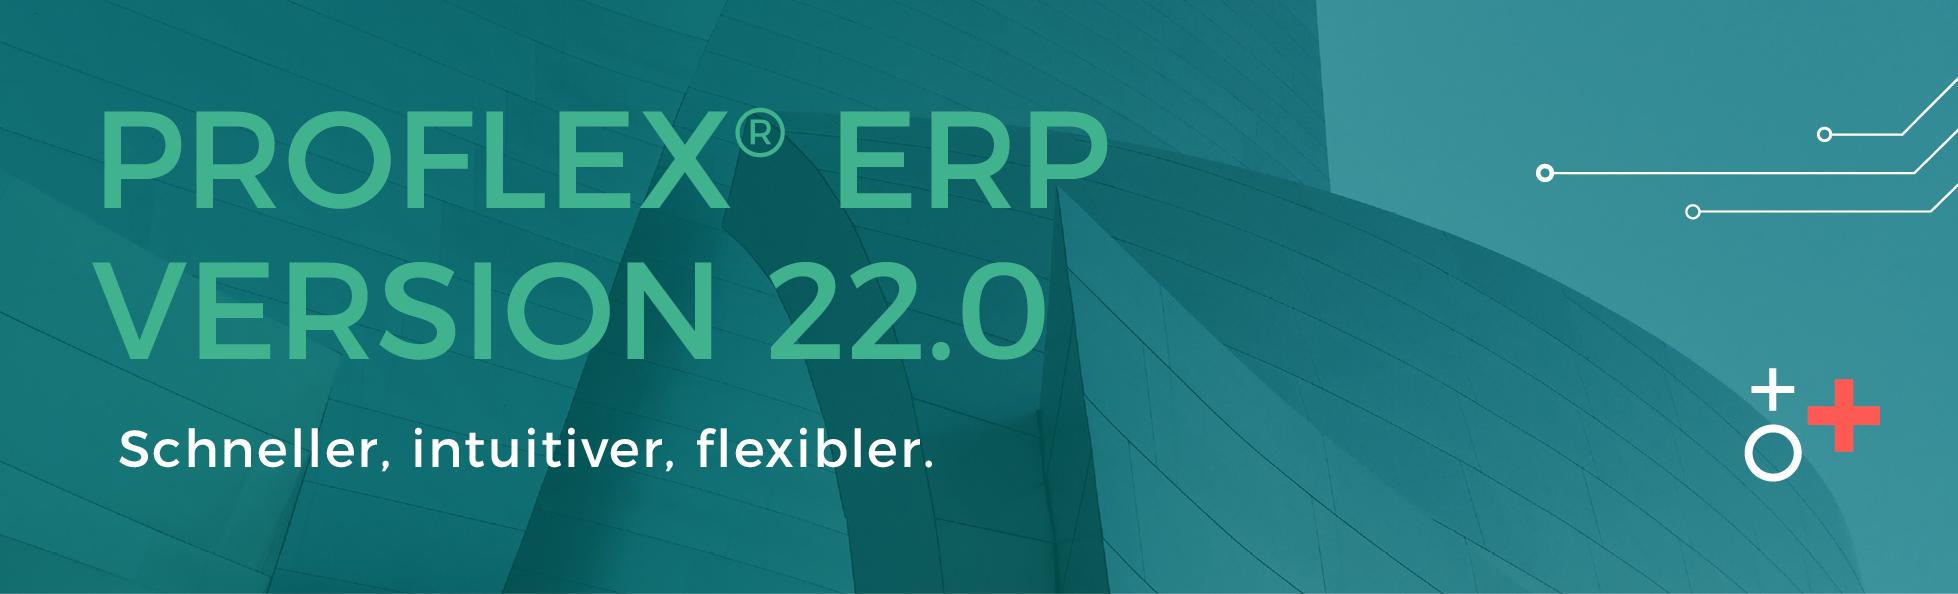 PROFLEX® ERP Version 22.0: Schneller, intuitiver, flexibler